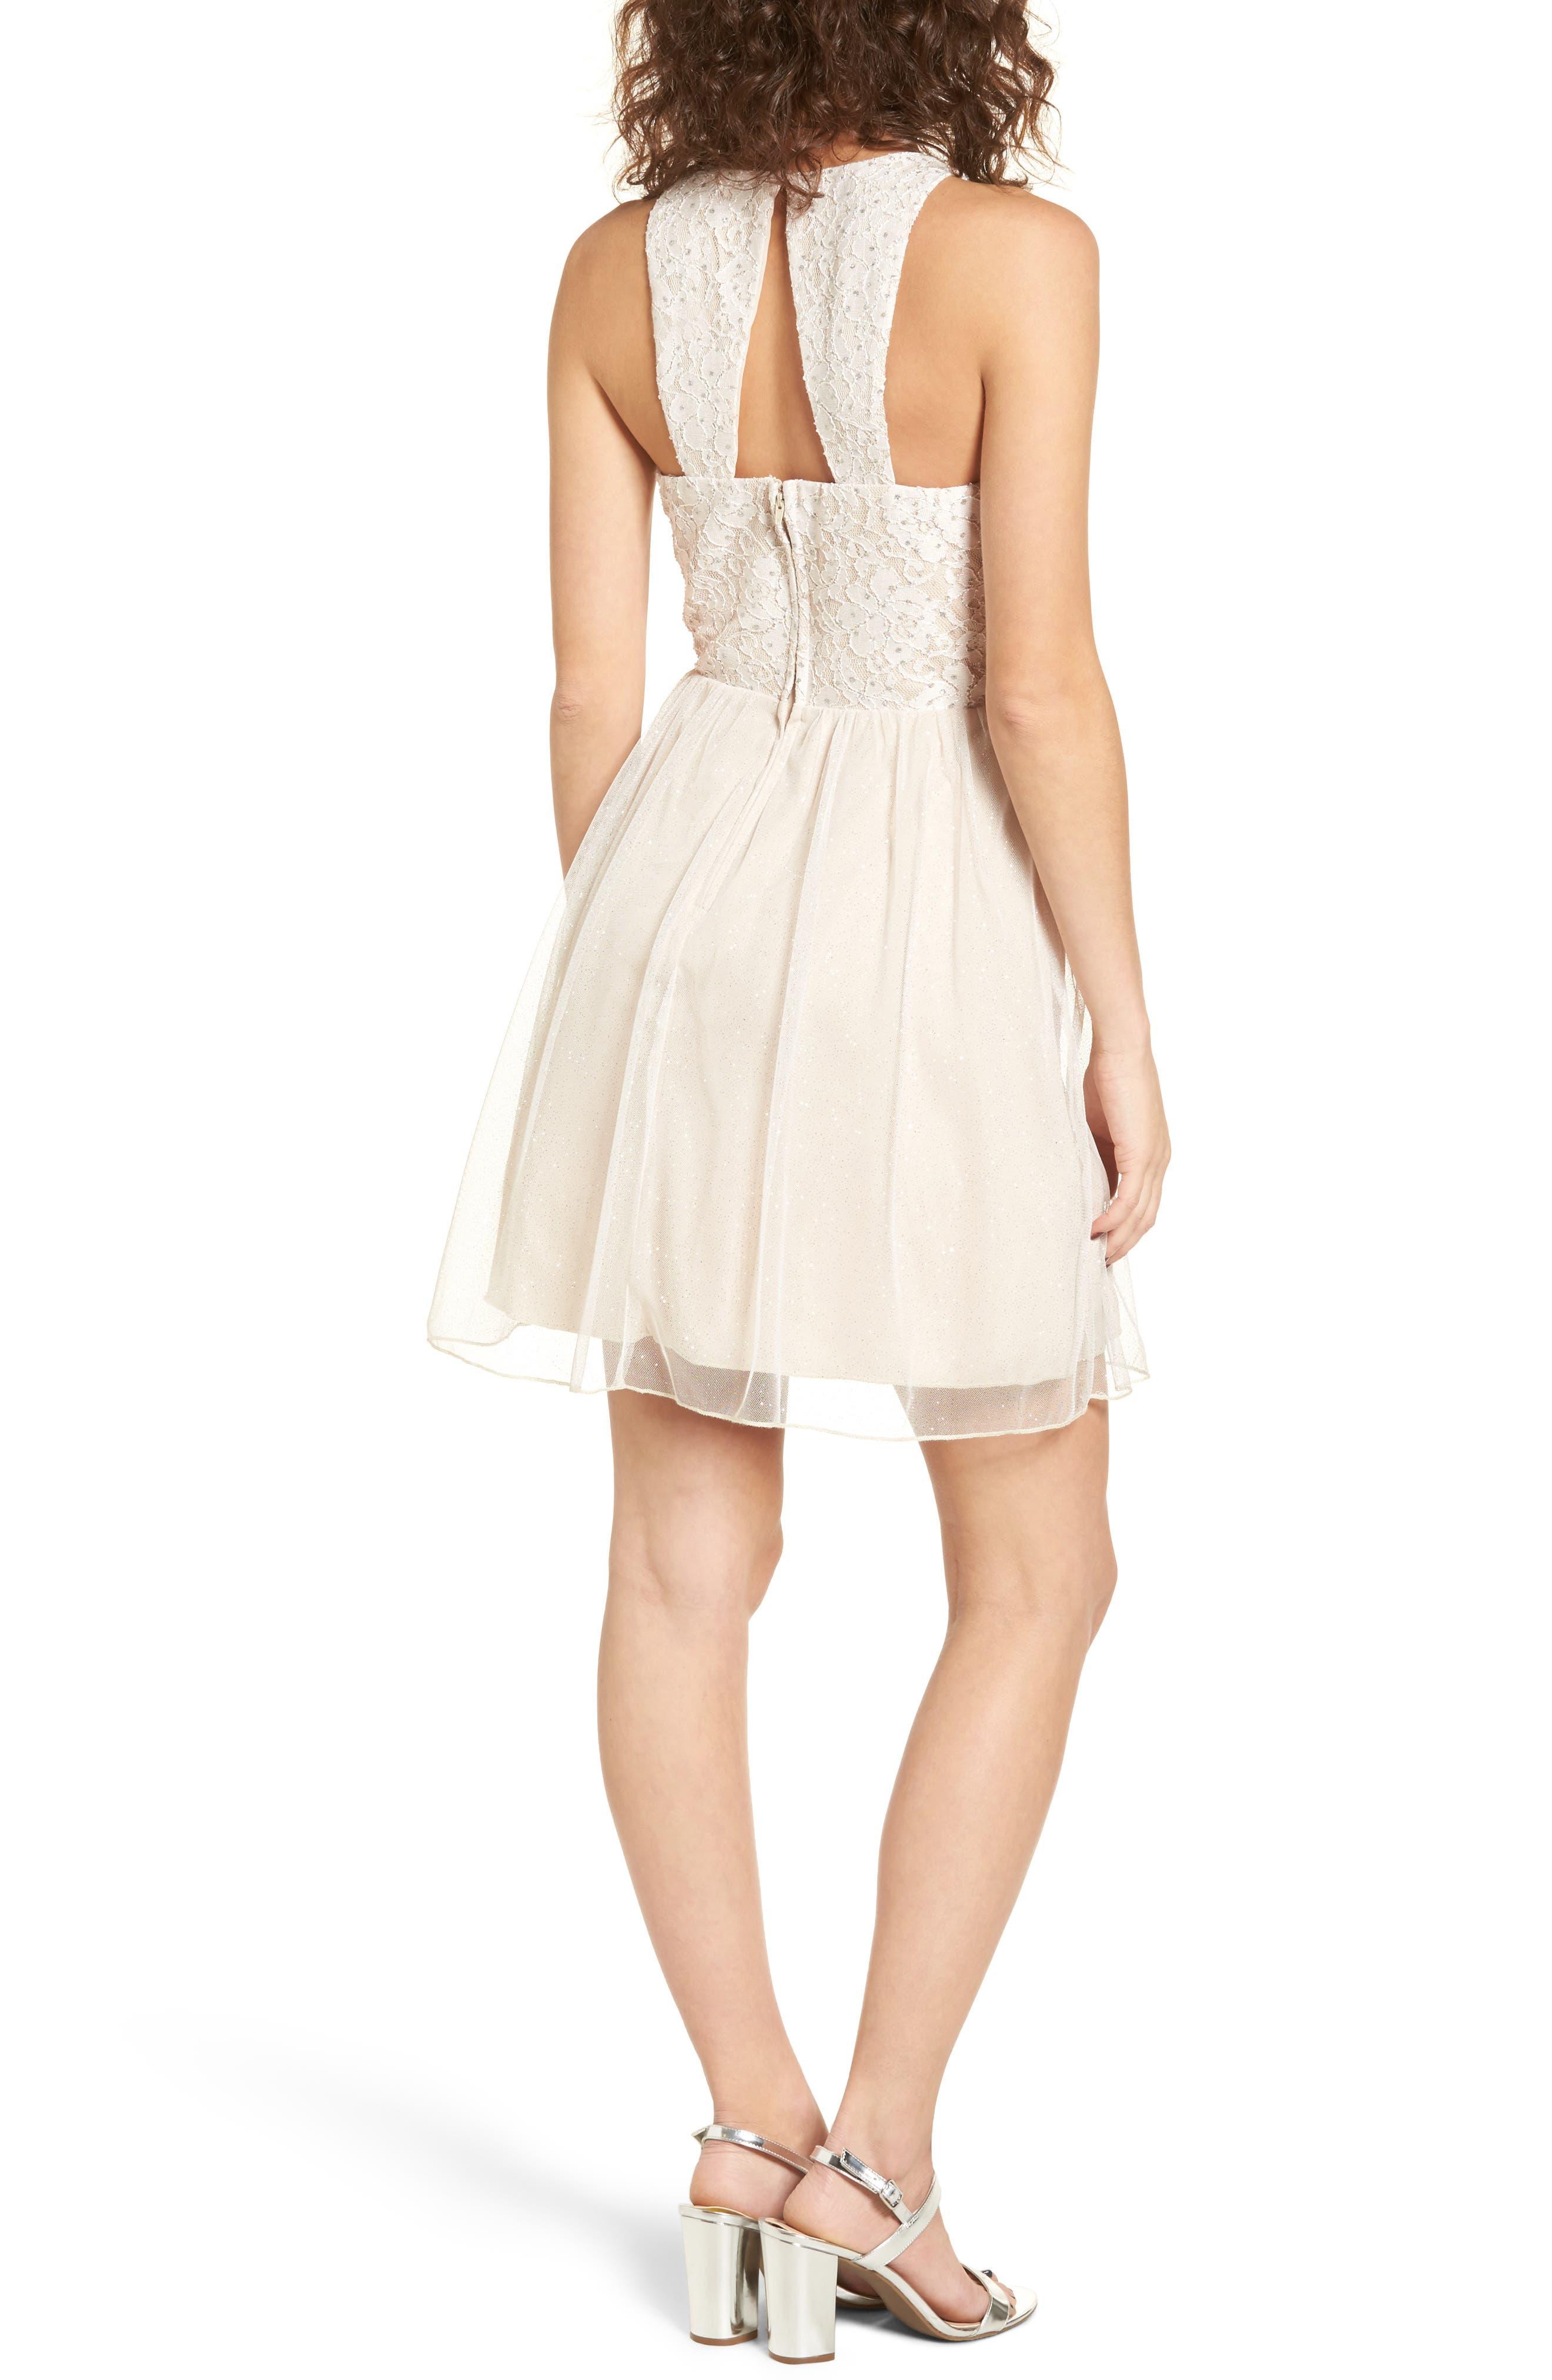 Glitter Tulle Dress,                             Alternate thumbnail 2, color,                             Blush